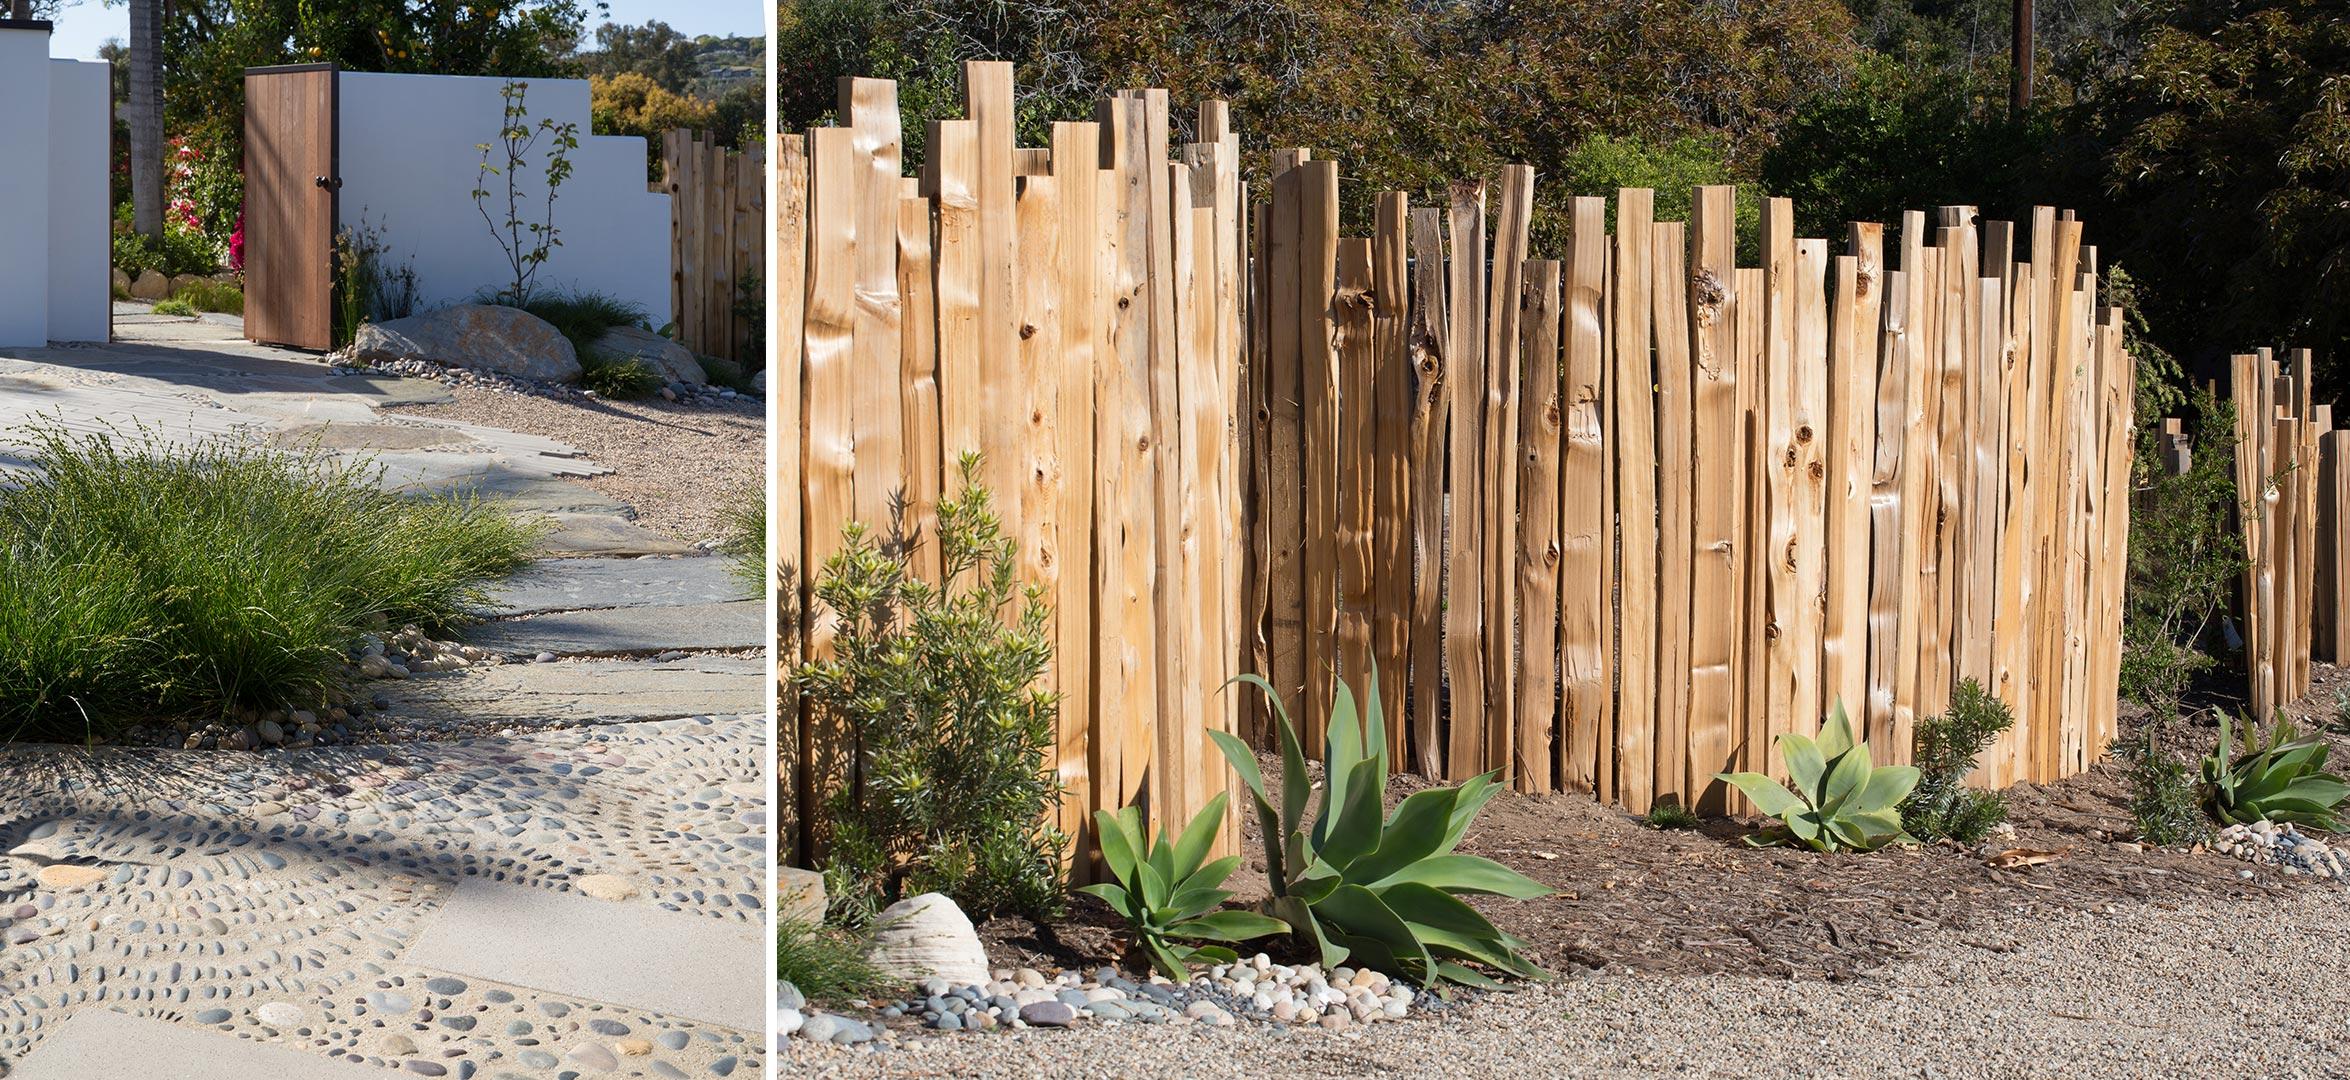 12-wooden-gate.jpg